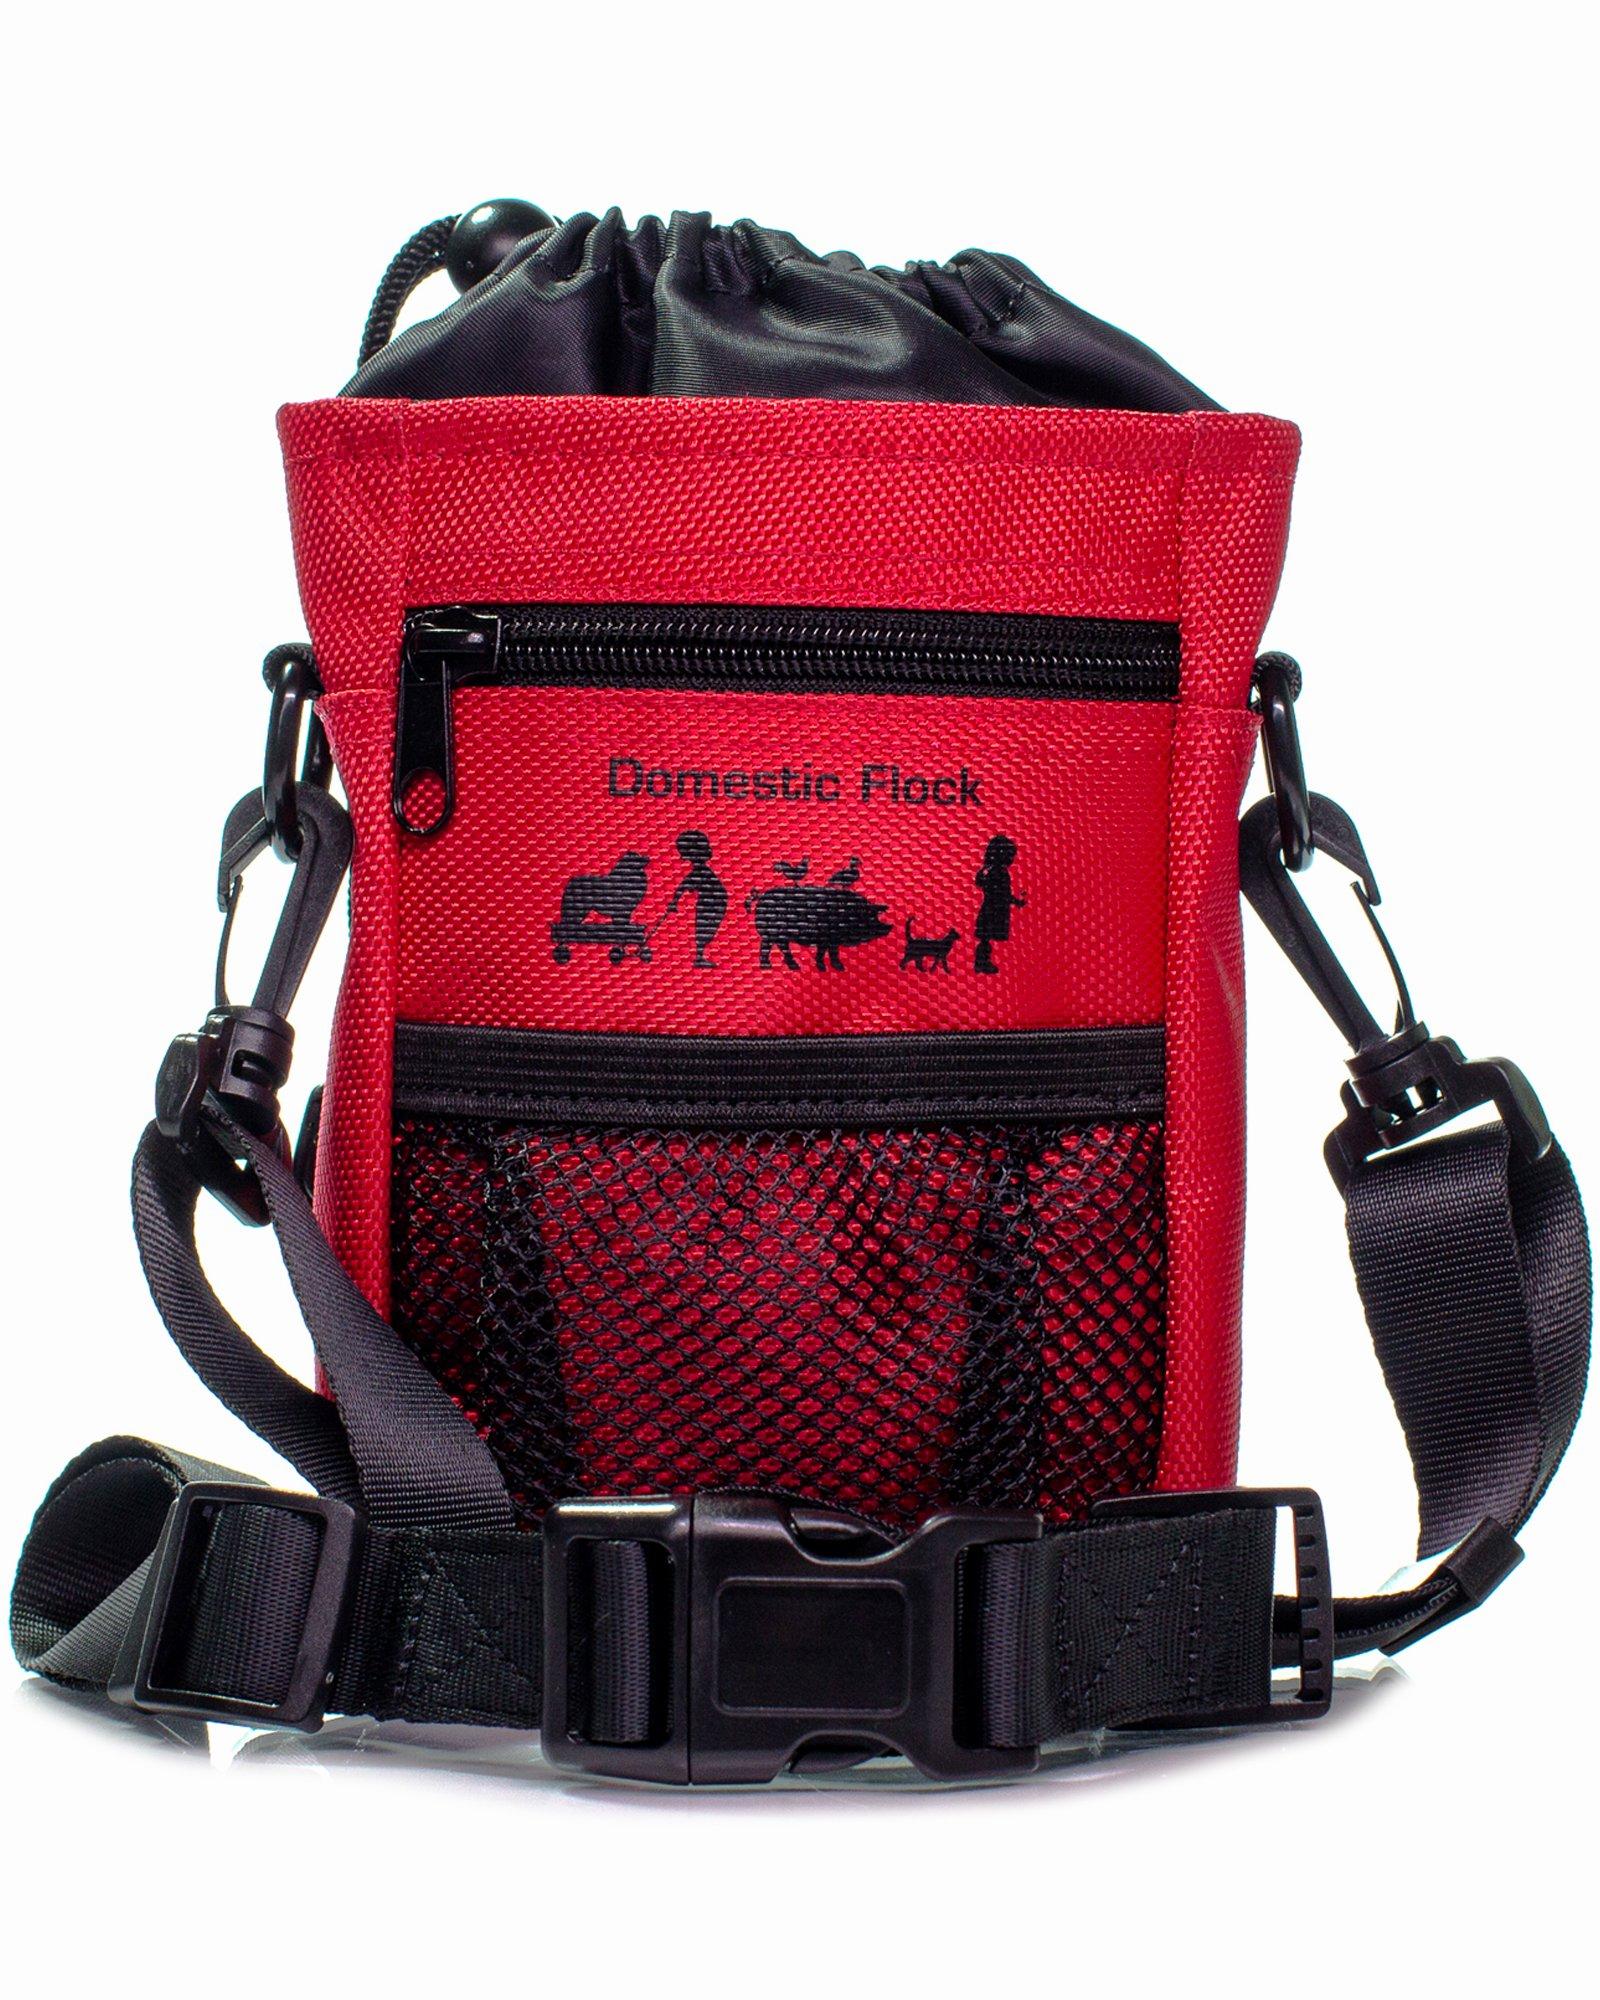 Treat Pouch with Bonus Waste Bags, Dog Treat Bag by Domestic Flock – Poop Bag Dispenser, Adjustable Shoulder Strap, 2 Zipper Pockets, Drawstring Pouch – Toy Holder